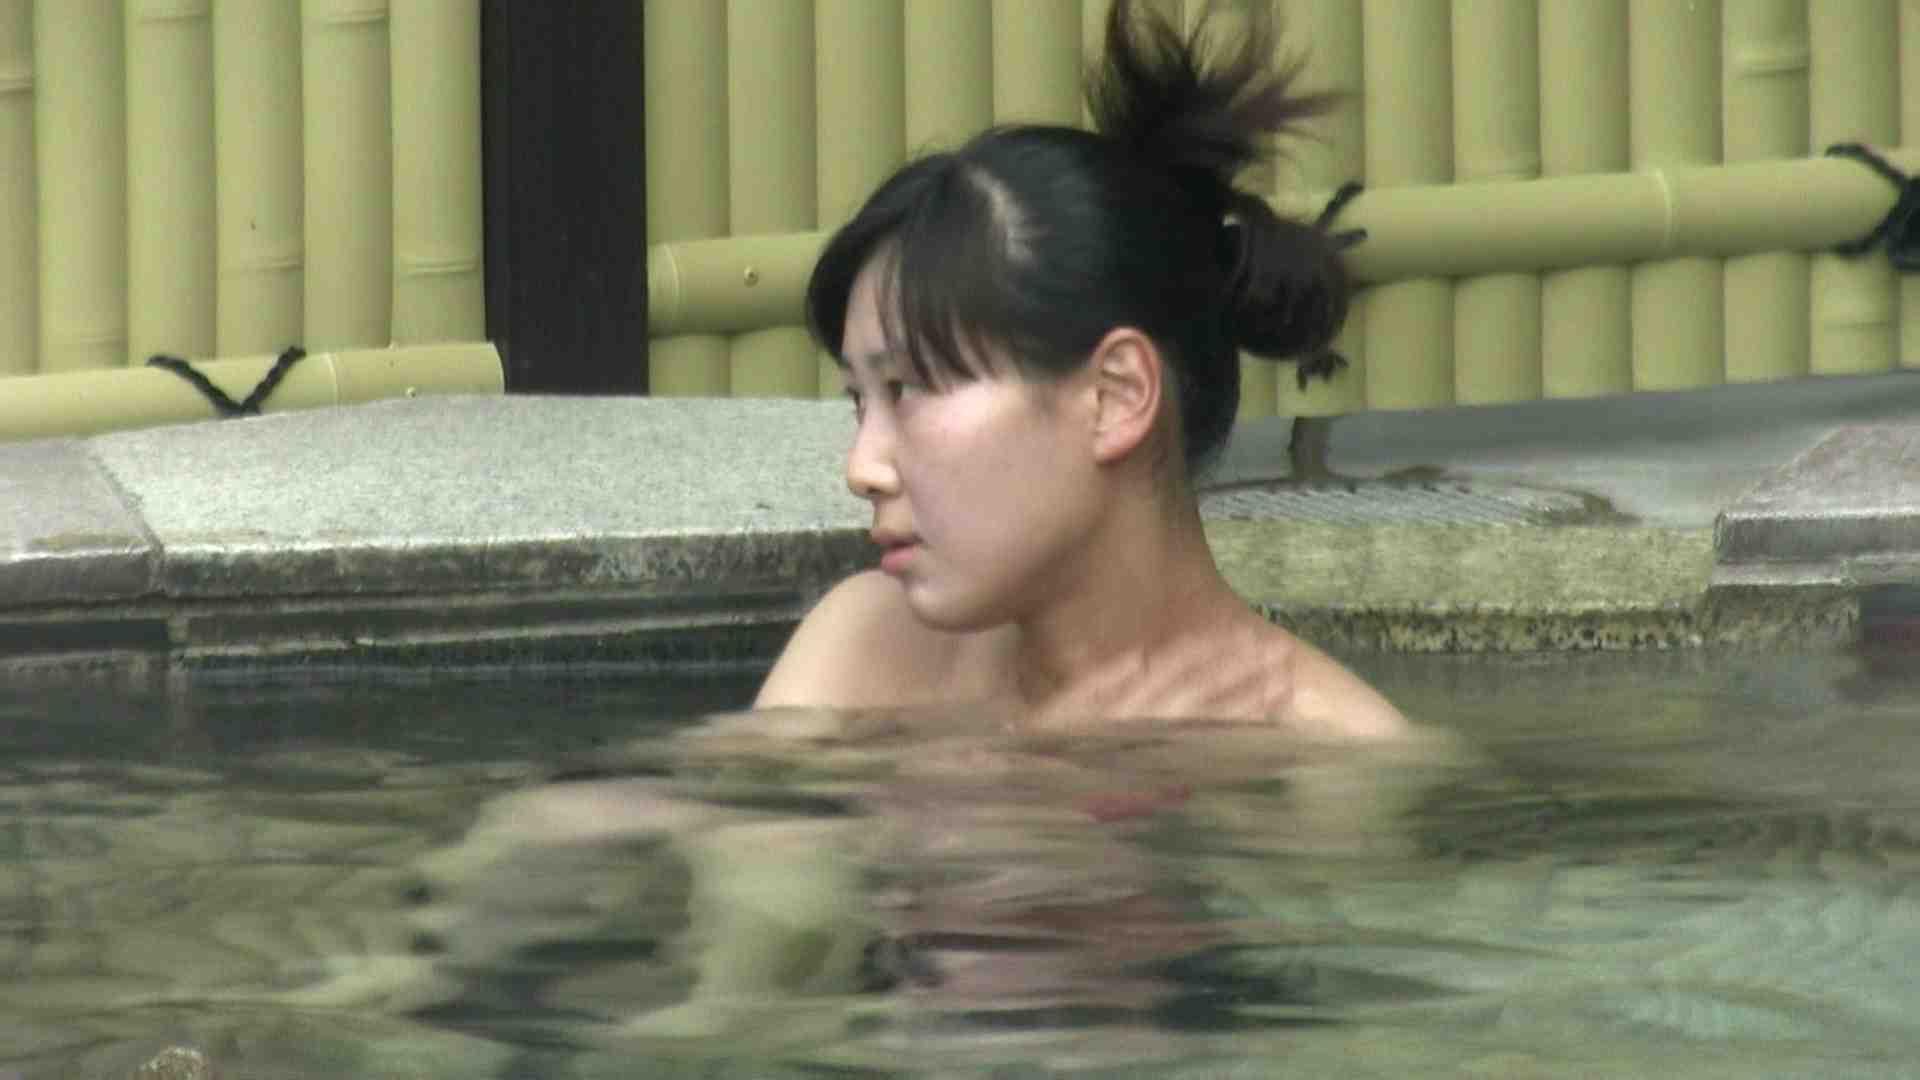 Aquaな露天風呂Vol.665 HなOL   盗撮  104pic 67